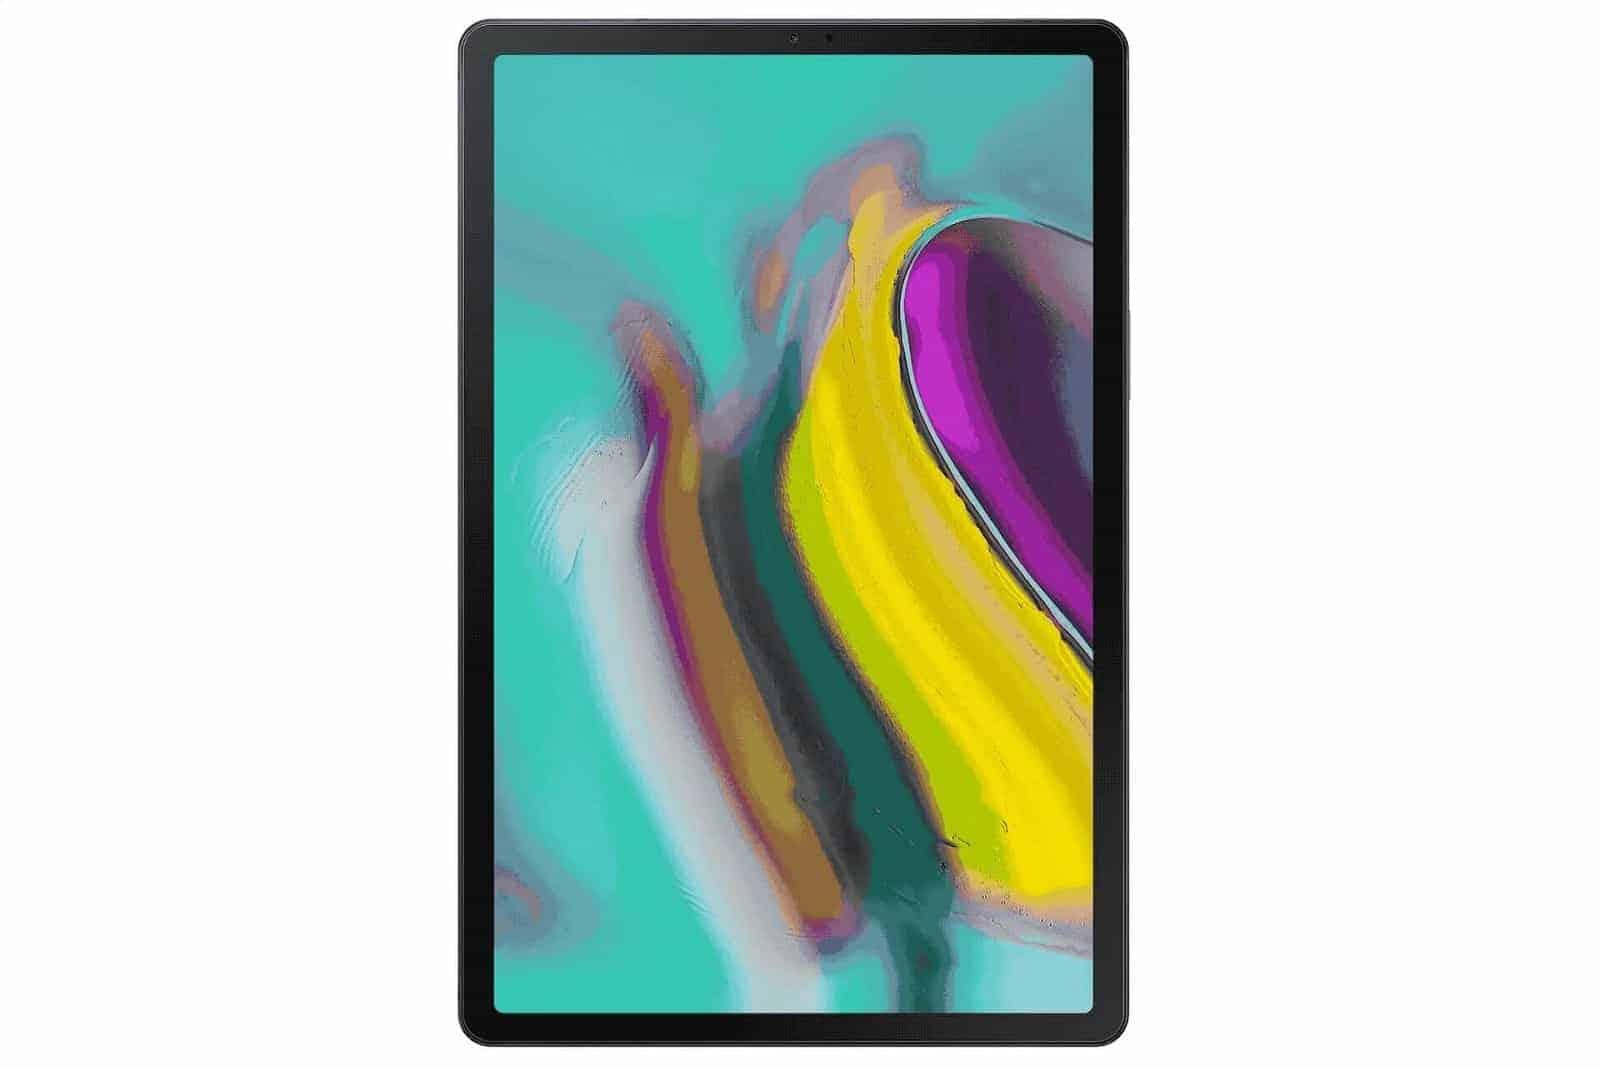 Galaxy Tab S5e 1 2019